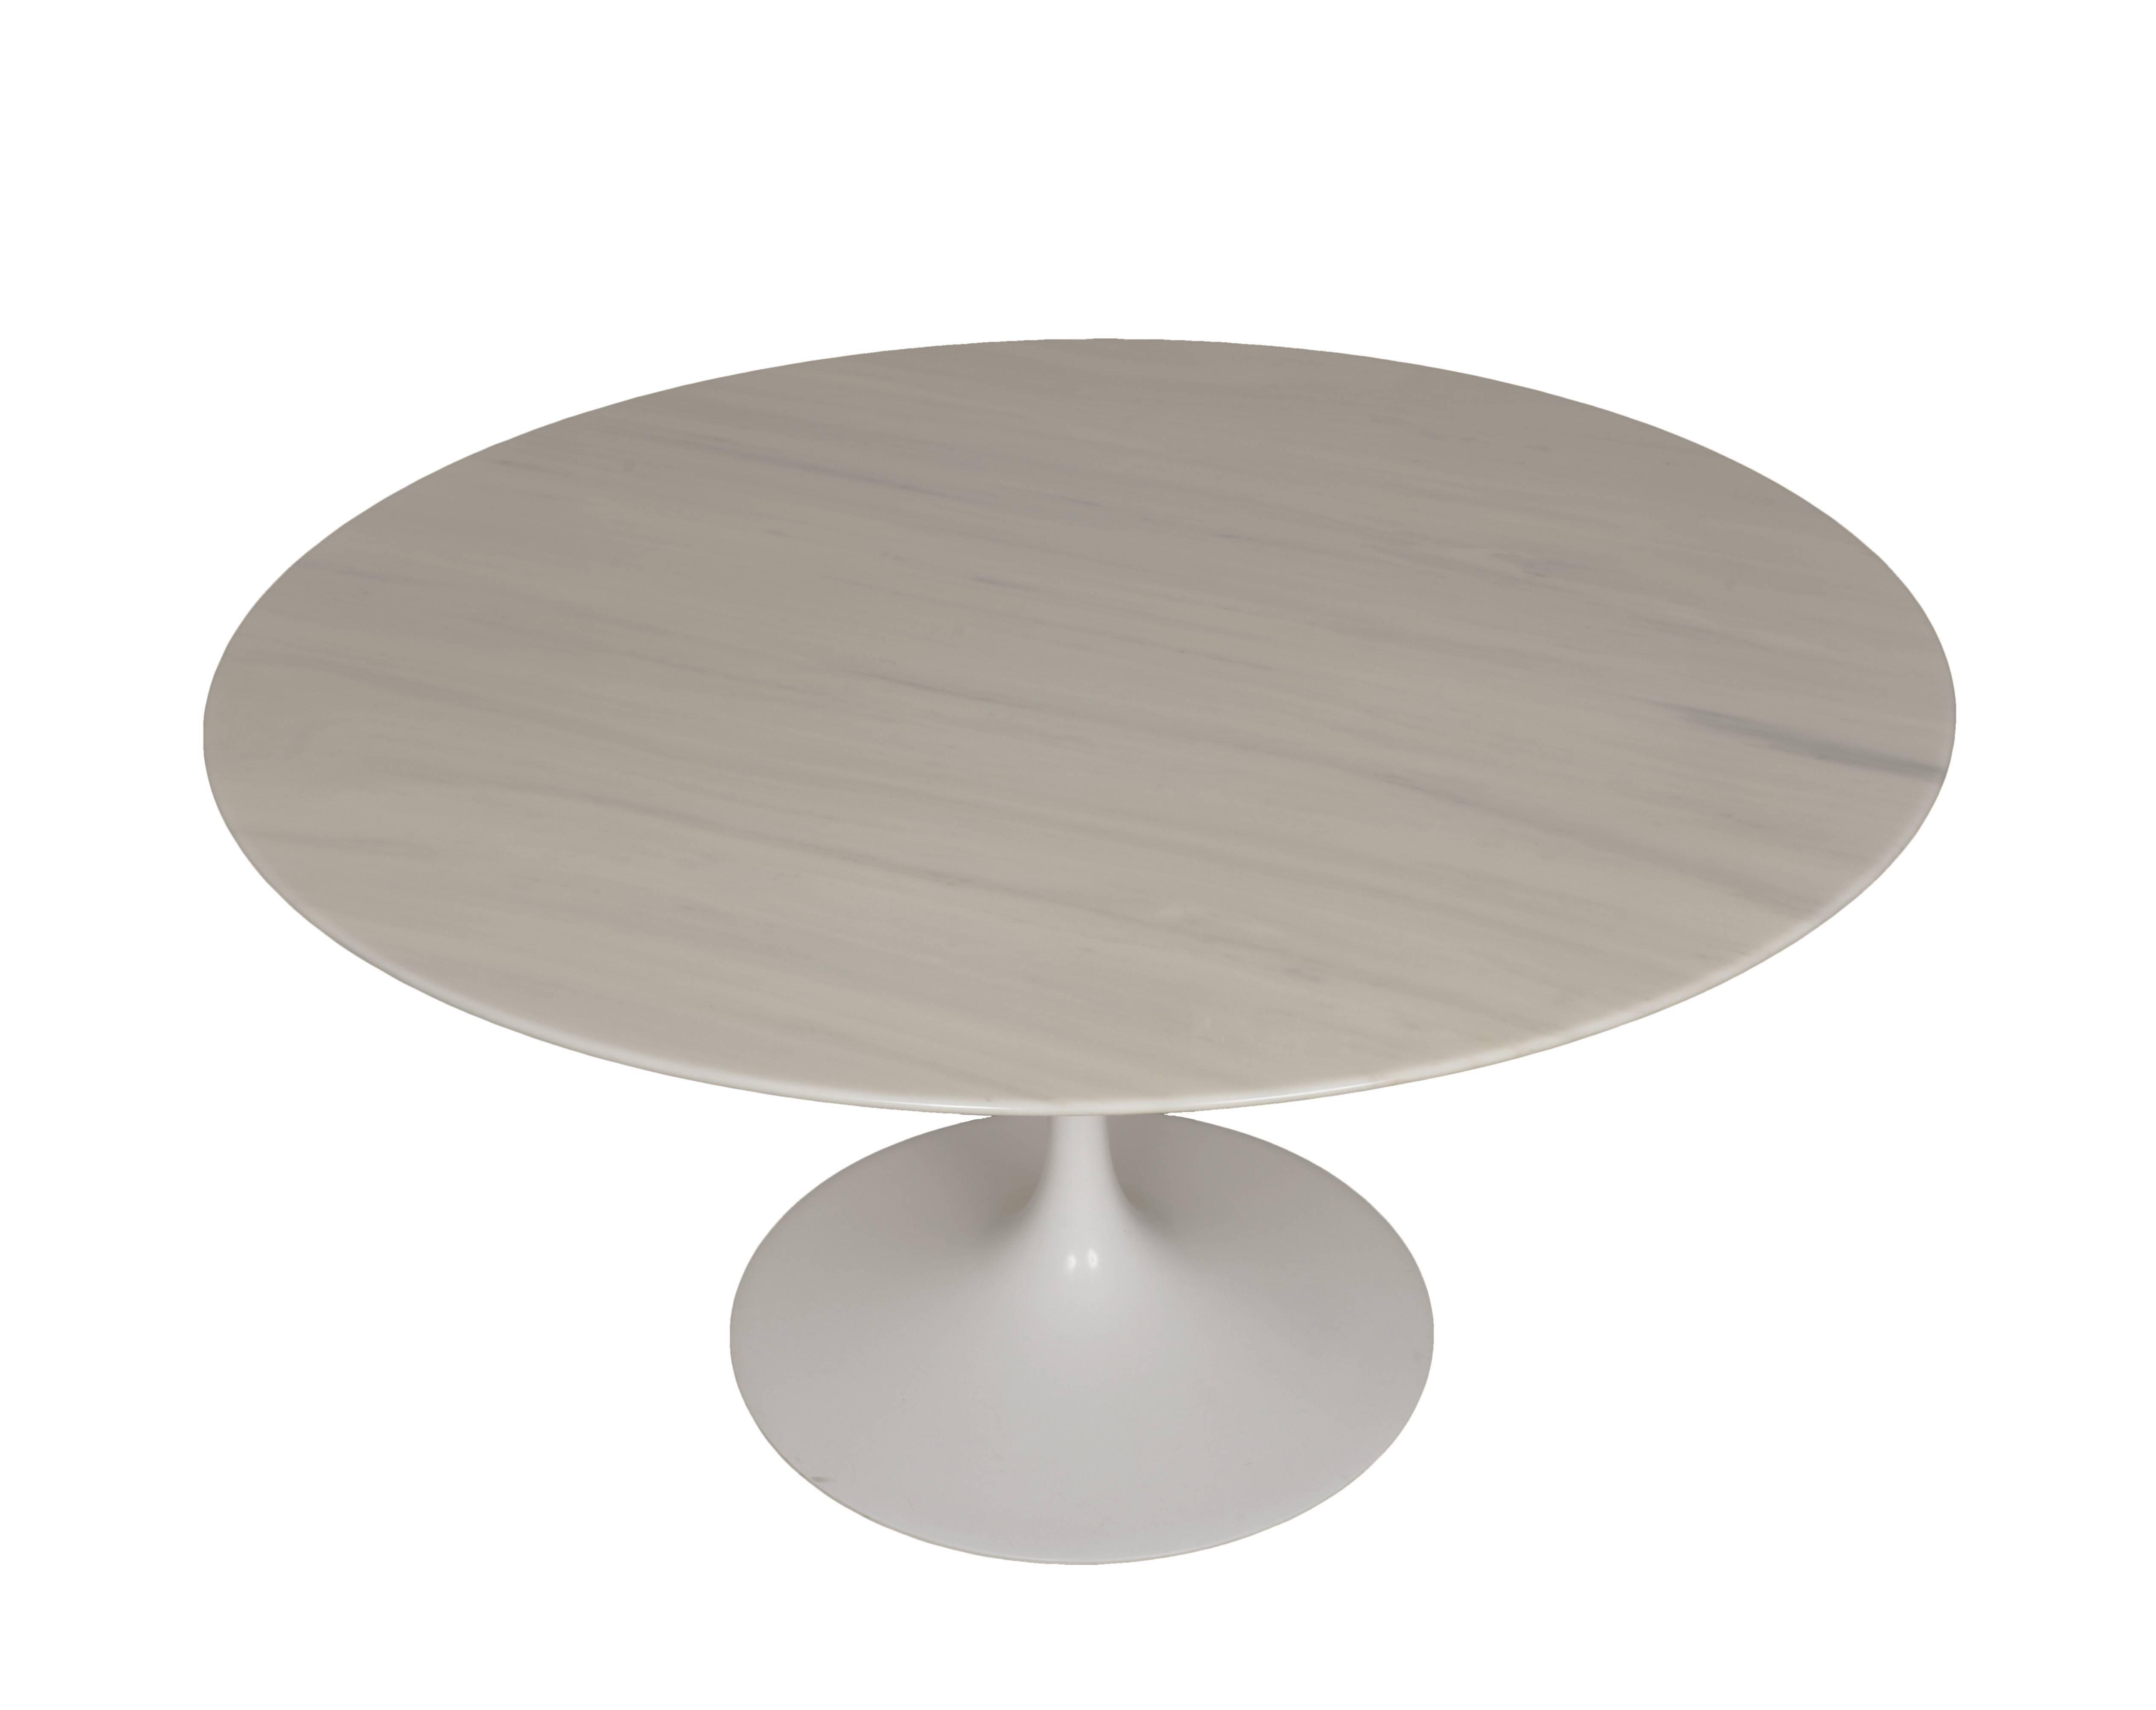 c93cb03a16c2 Eero Saarinen Tulip Carrara Marble Dinning Table Round